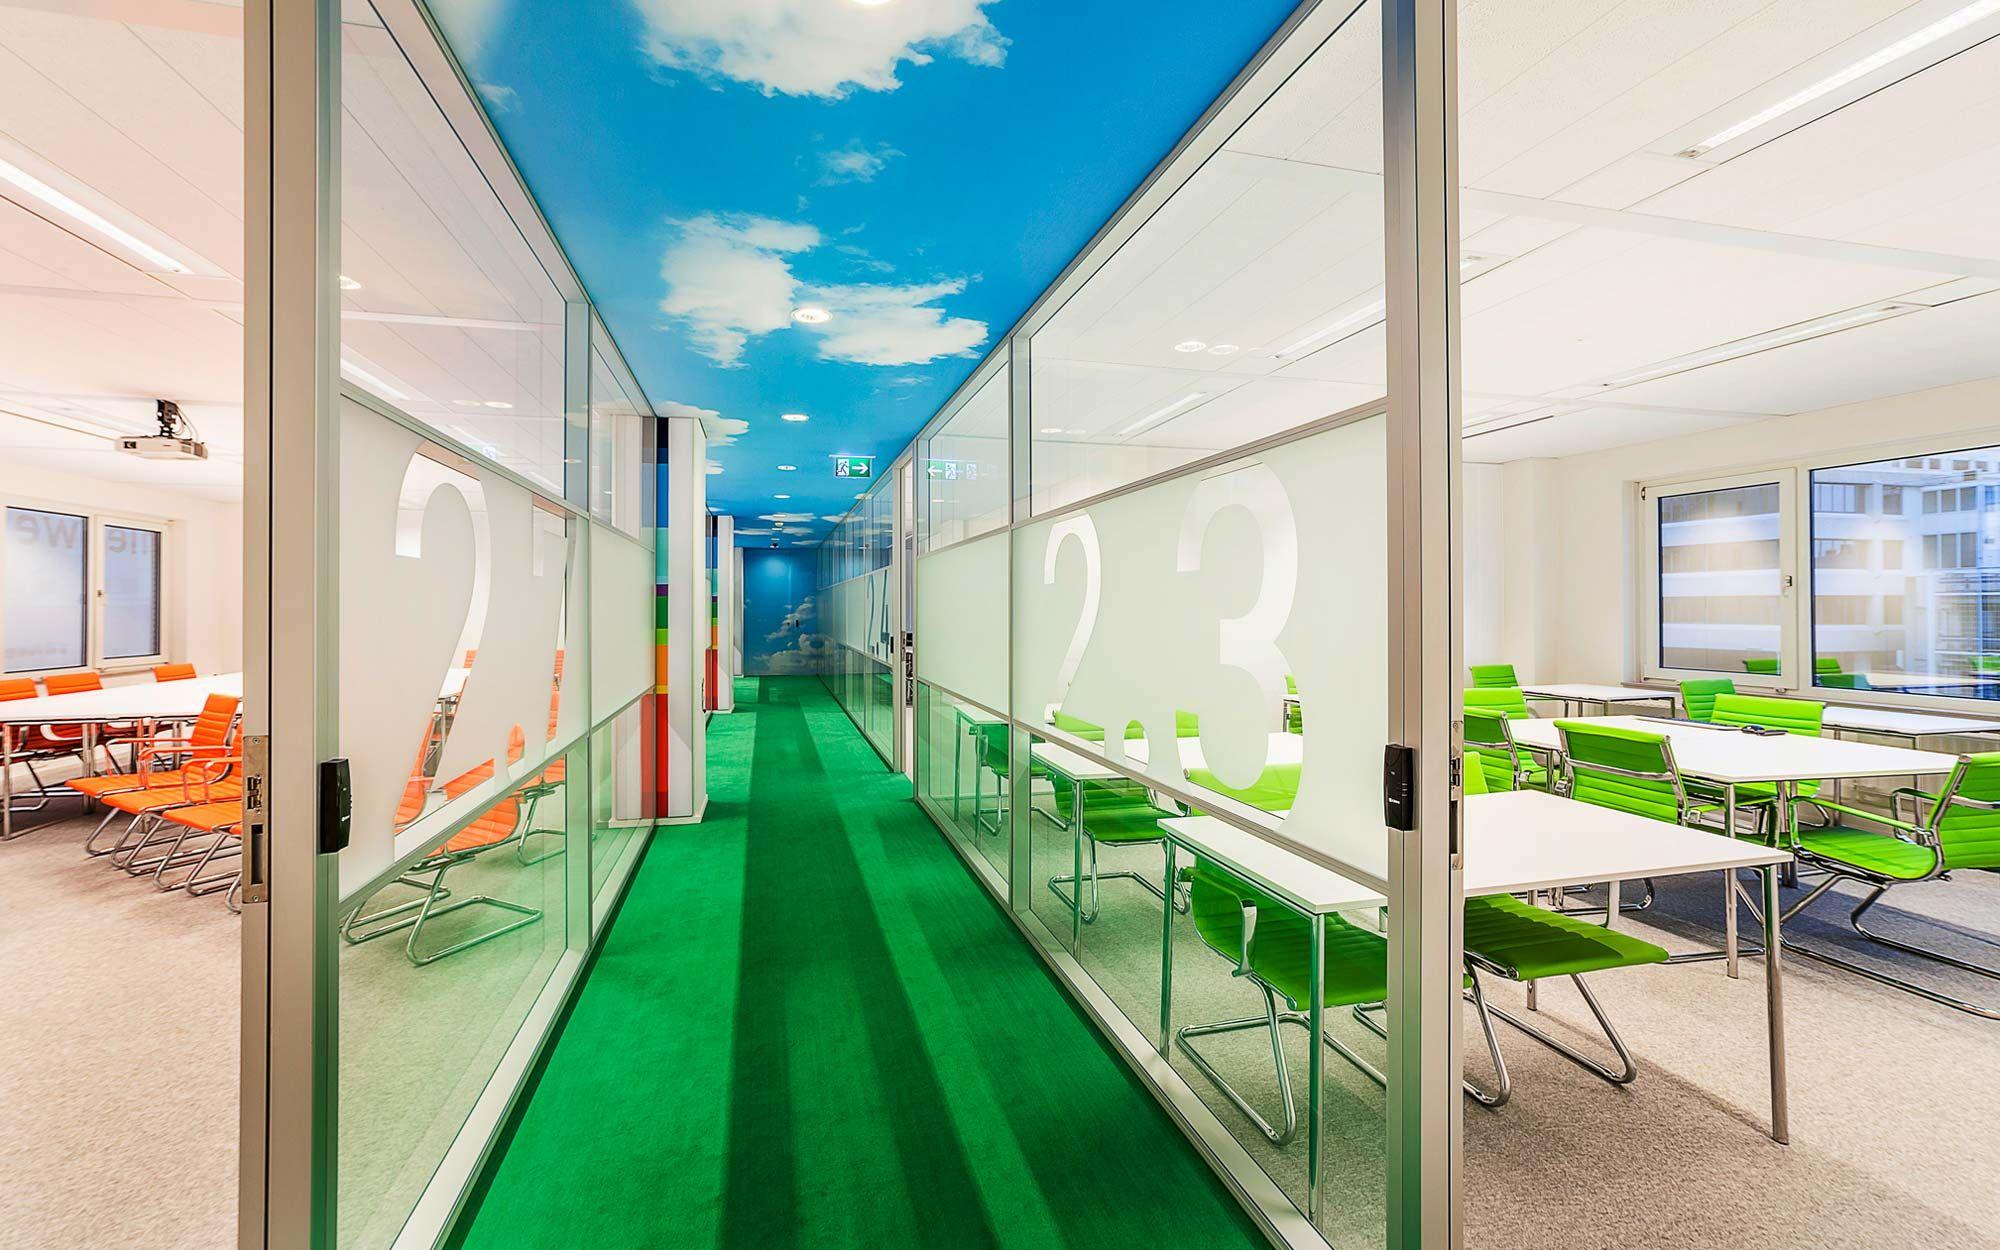 #systeemwanden  #glaswanden  #scheidingswanden  #kantoorwanden  #kantooroplossingen #interieurwerk #binnendeuren